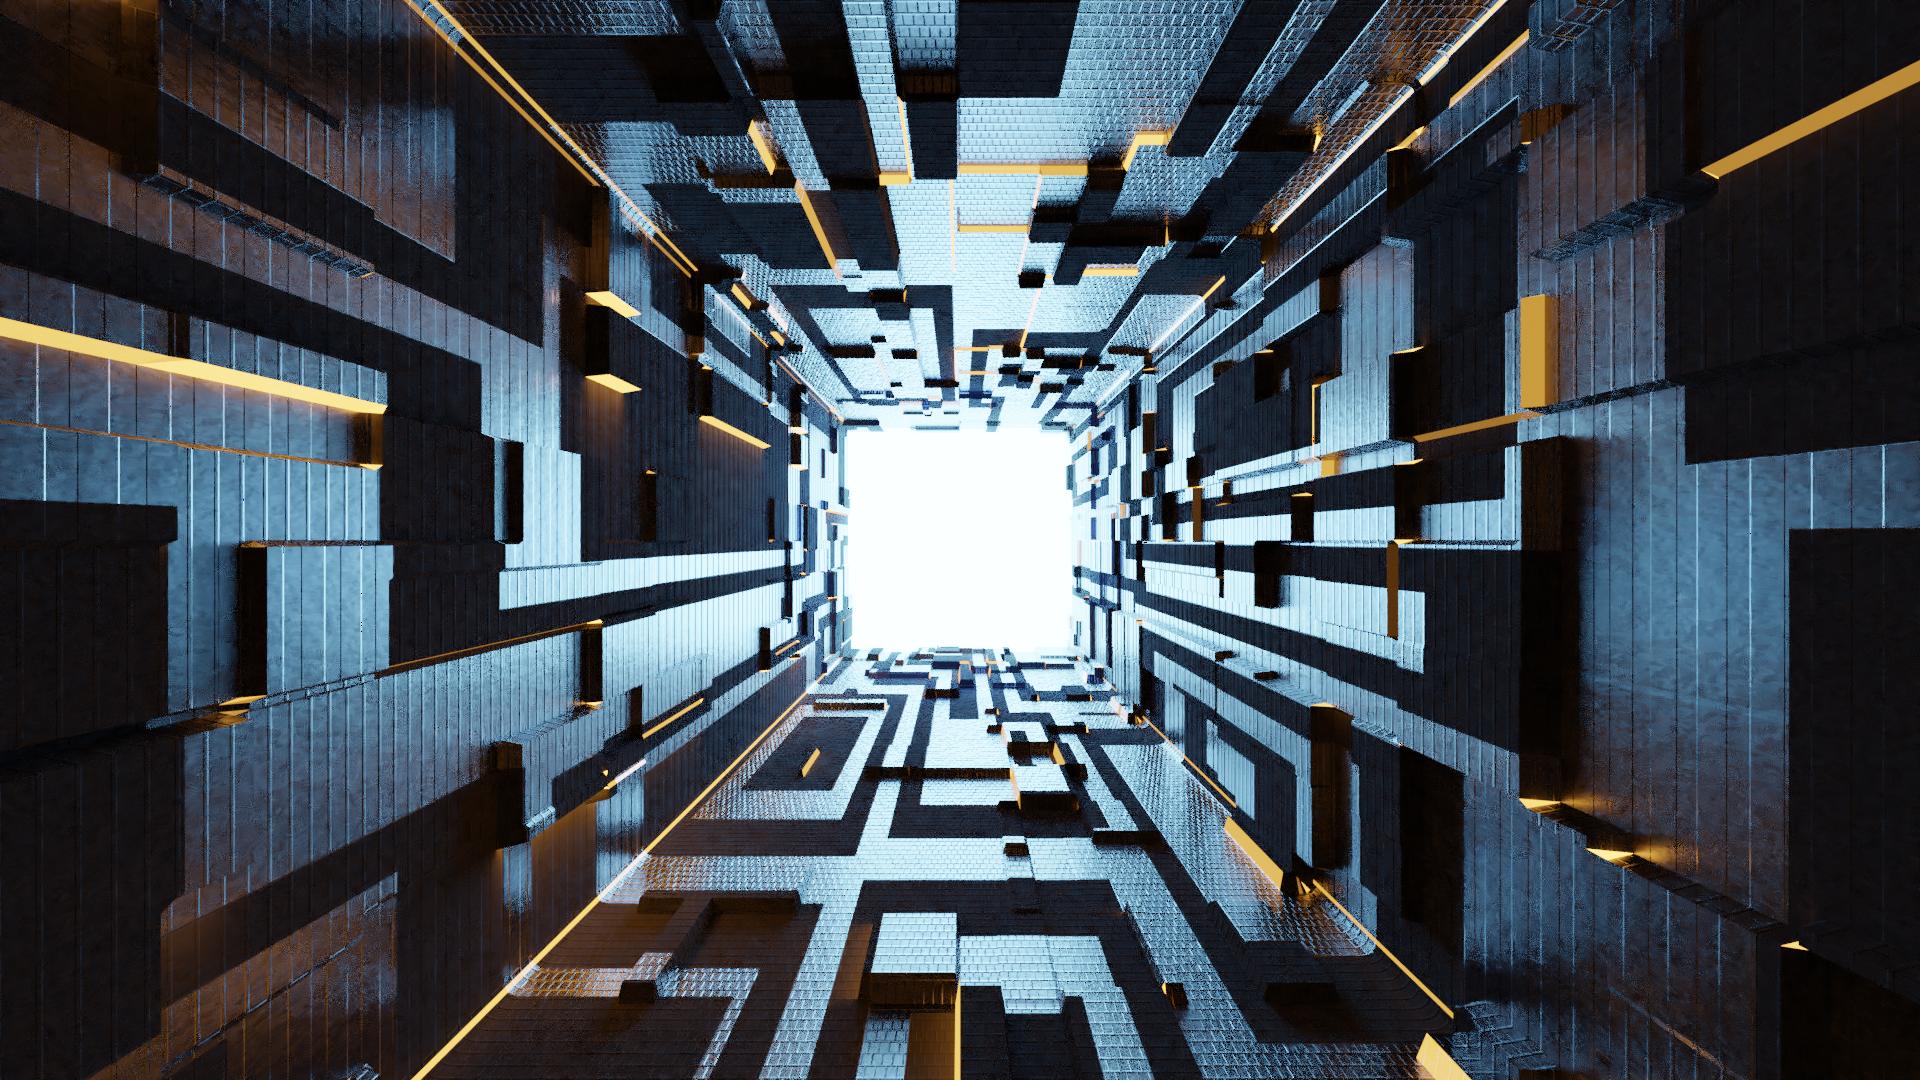 Sci-Fi Corridor